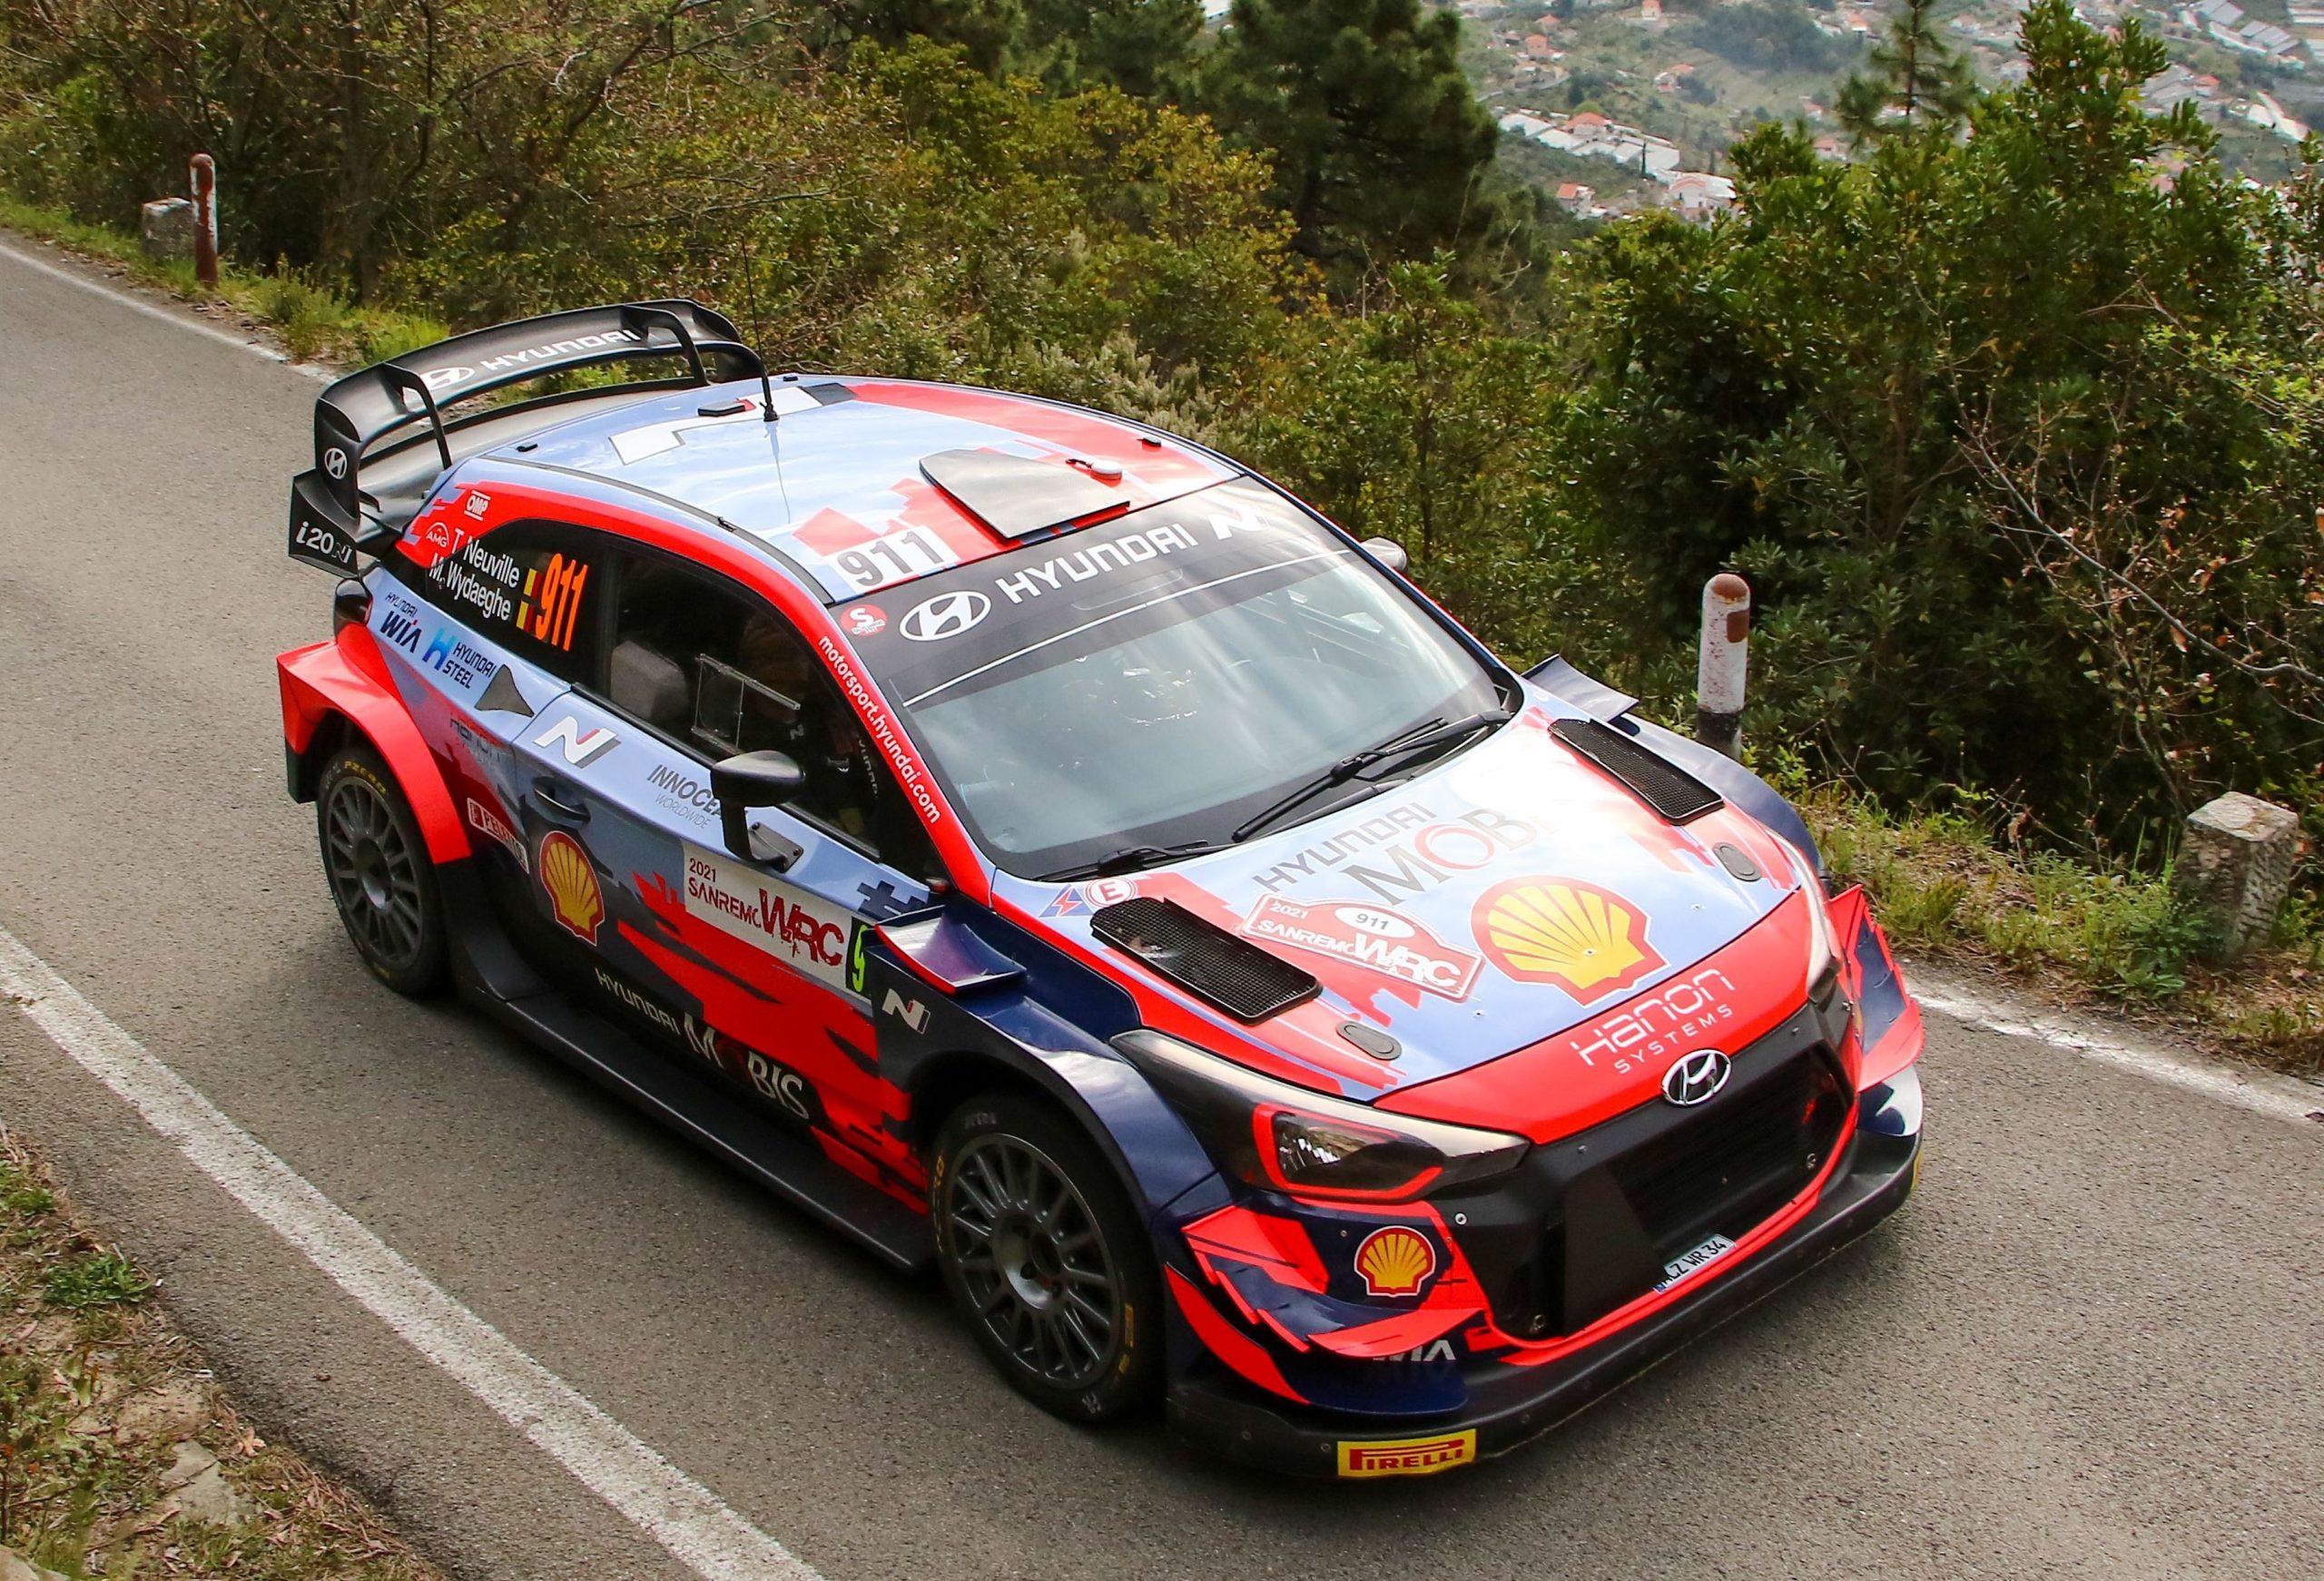 RALLY – 105^ Targa Florio: sapore mondiale con la presenza di Hyundai Motorsport